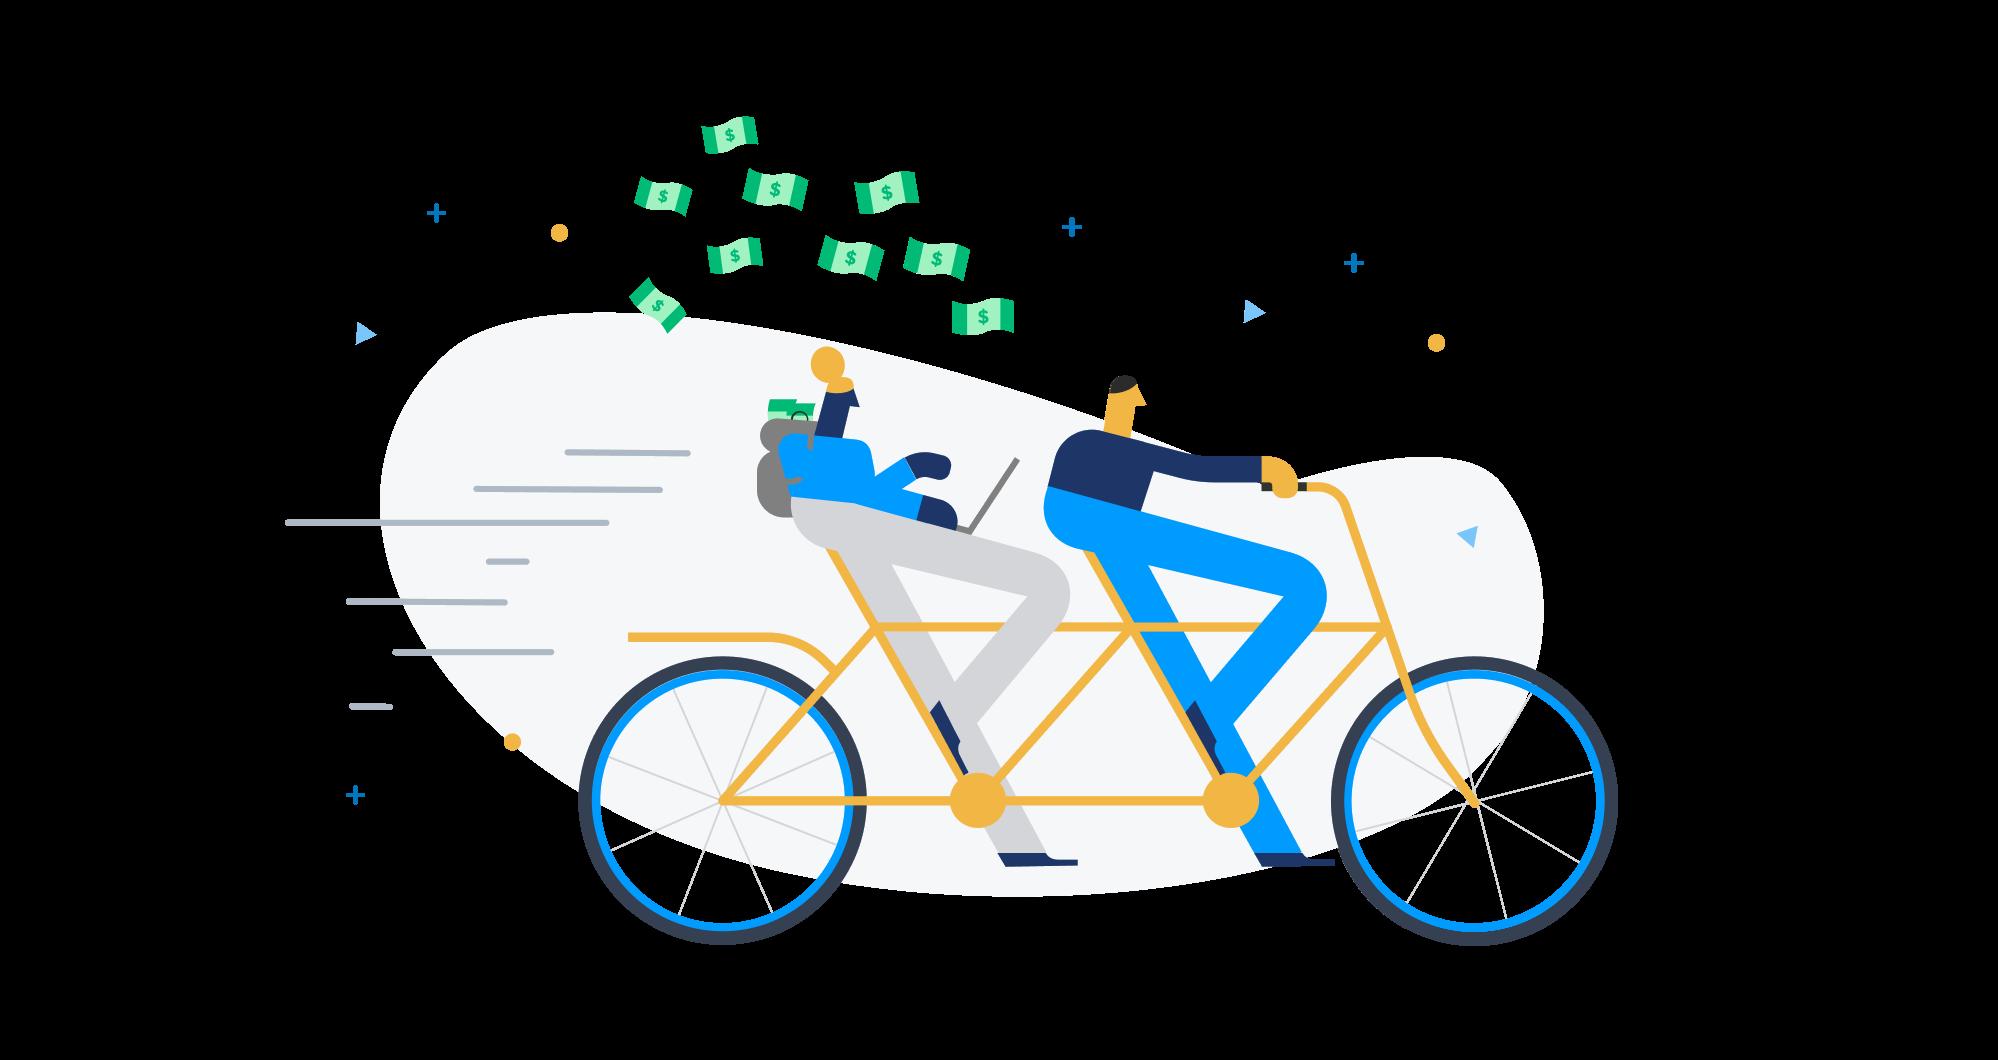 Entrepreneurs riding a bike with JumpStart money